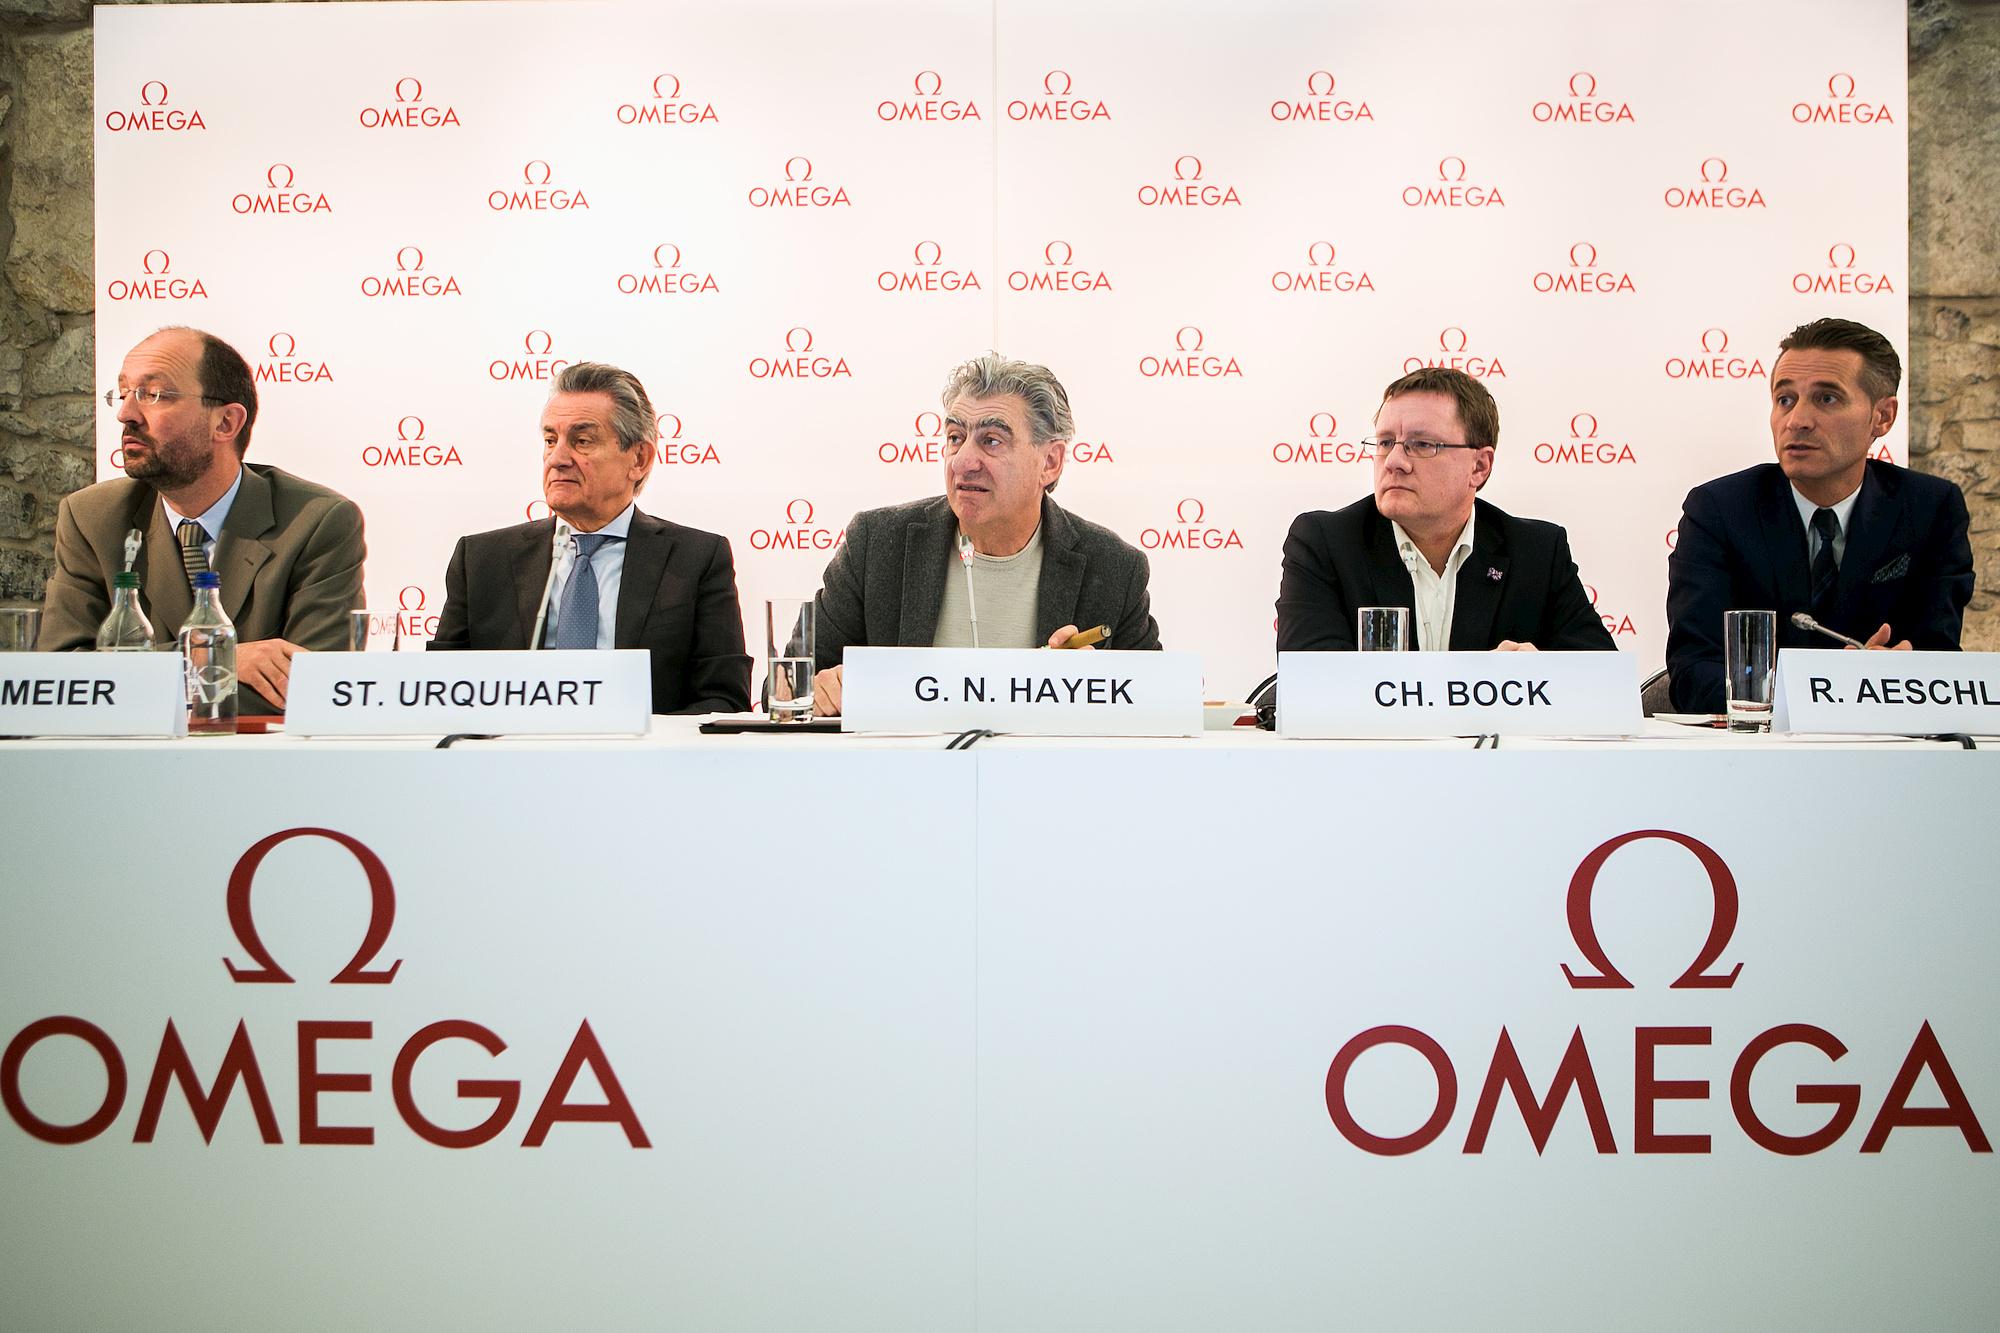 Mr Hayek announcing the partnership between Omega and METAS in December 2014©Omega Ltd